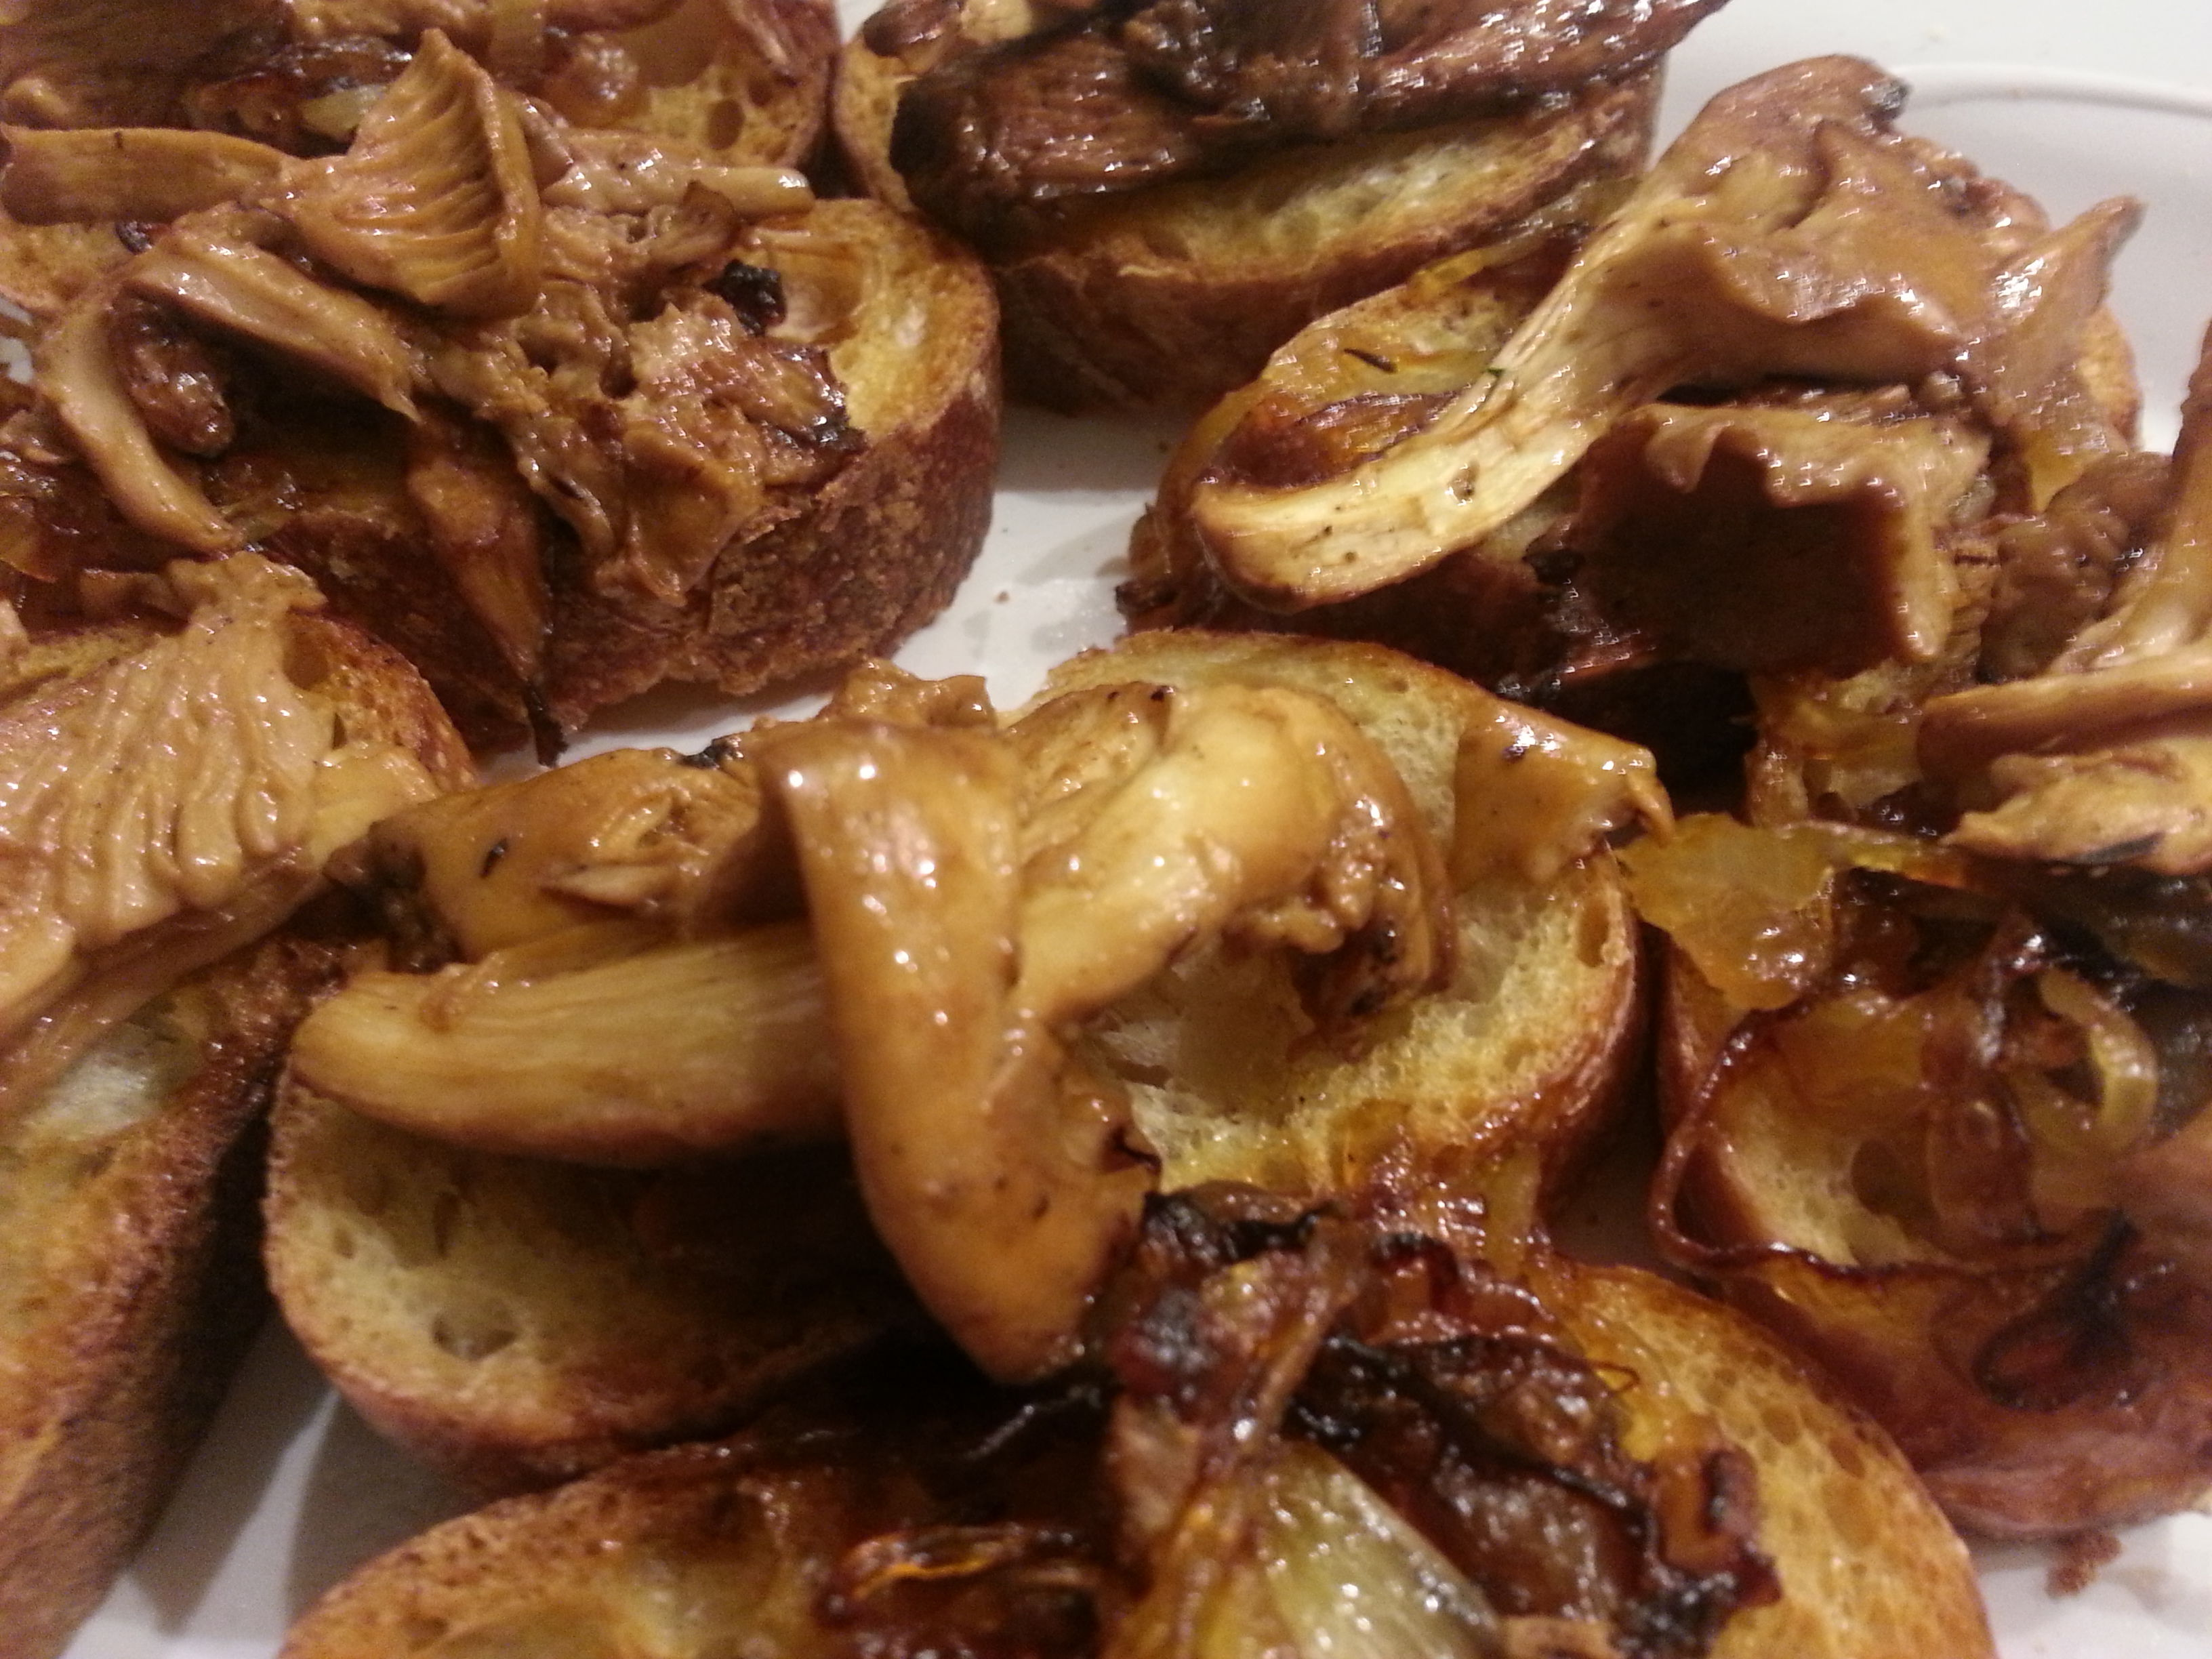 Chanterelle and Caramelized Onion Bruschetta